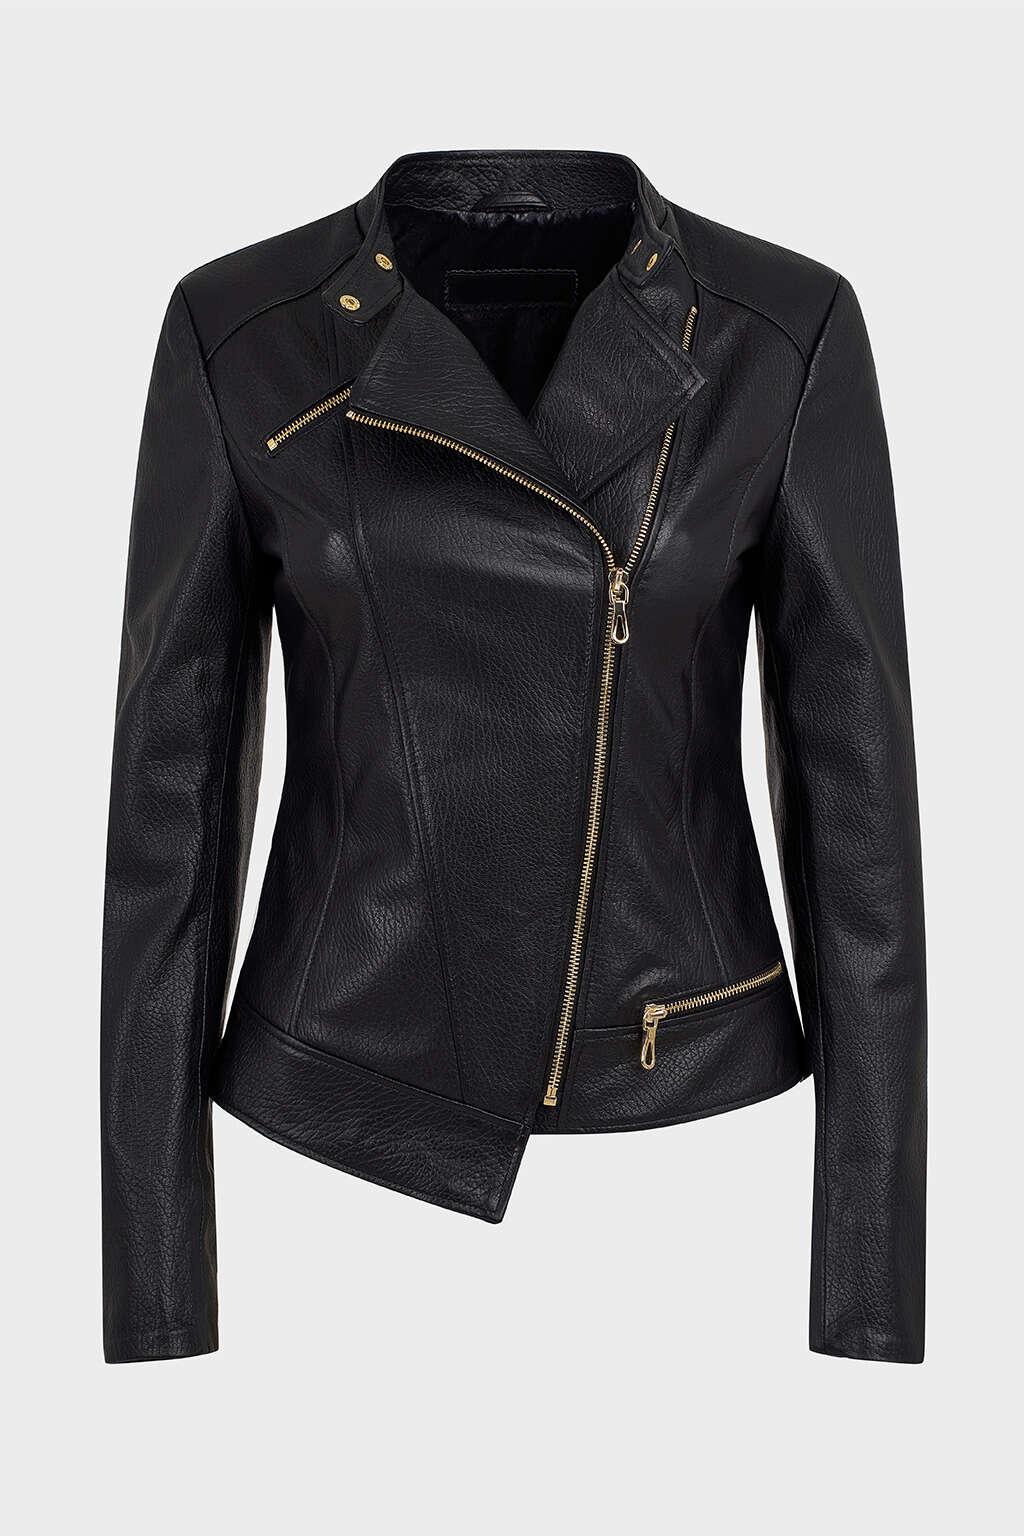 Front of Black Asymmetrical Biker Leather Jacket